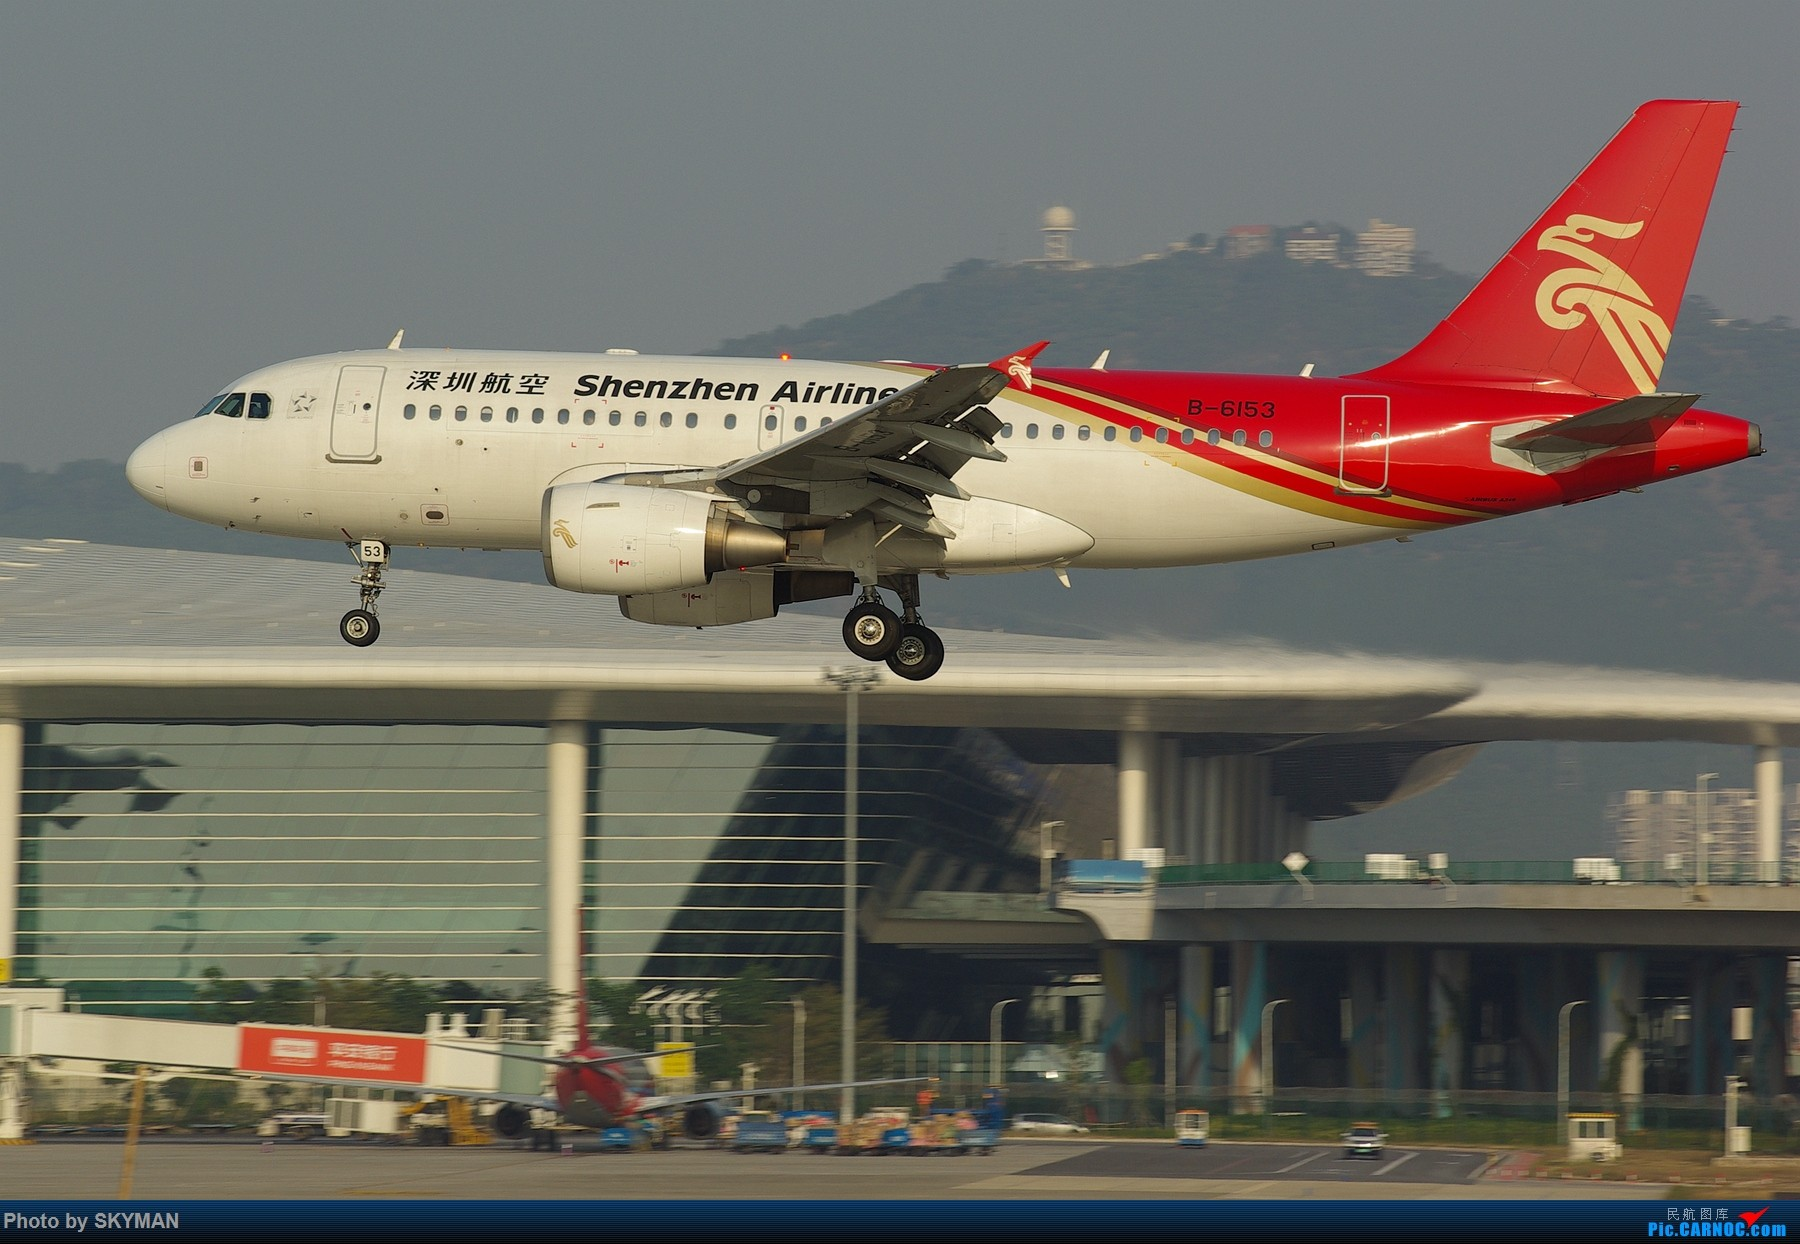 Re:[原创]BLDDQ---内痕么 以目前的形式靠打工实在是揭不开锅了 各位爷列为亲看着意思点啊 别控制 可是今天下午刚出炉的 绝对新鲜热乎 AIRBUS A319-100 B-6153 中国深圳宝安国际机场